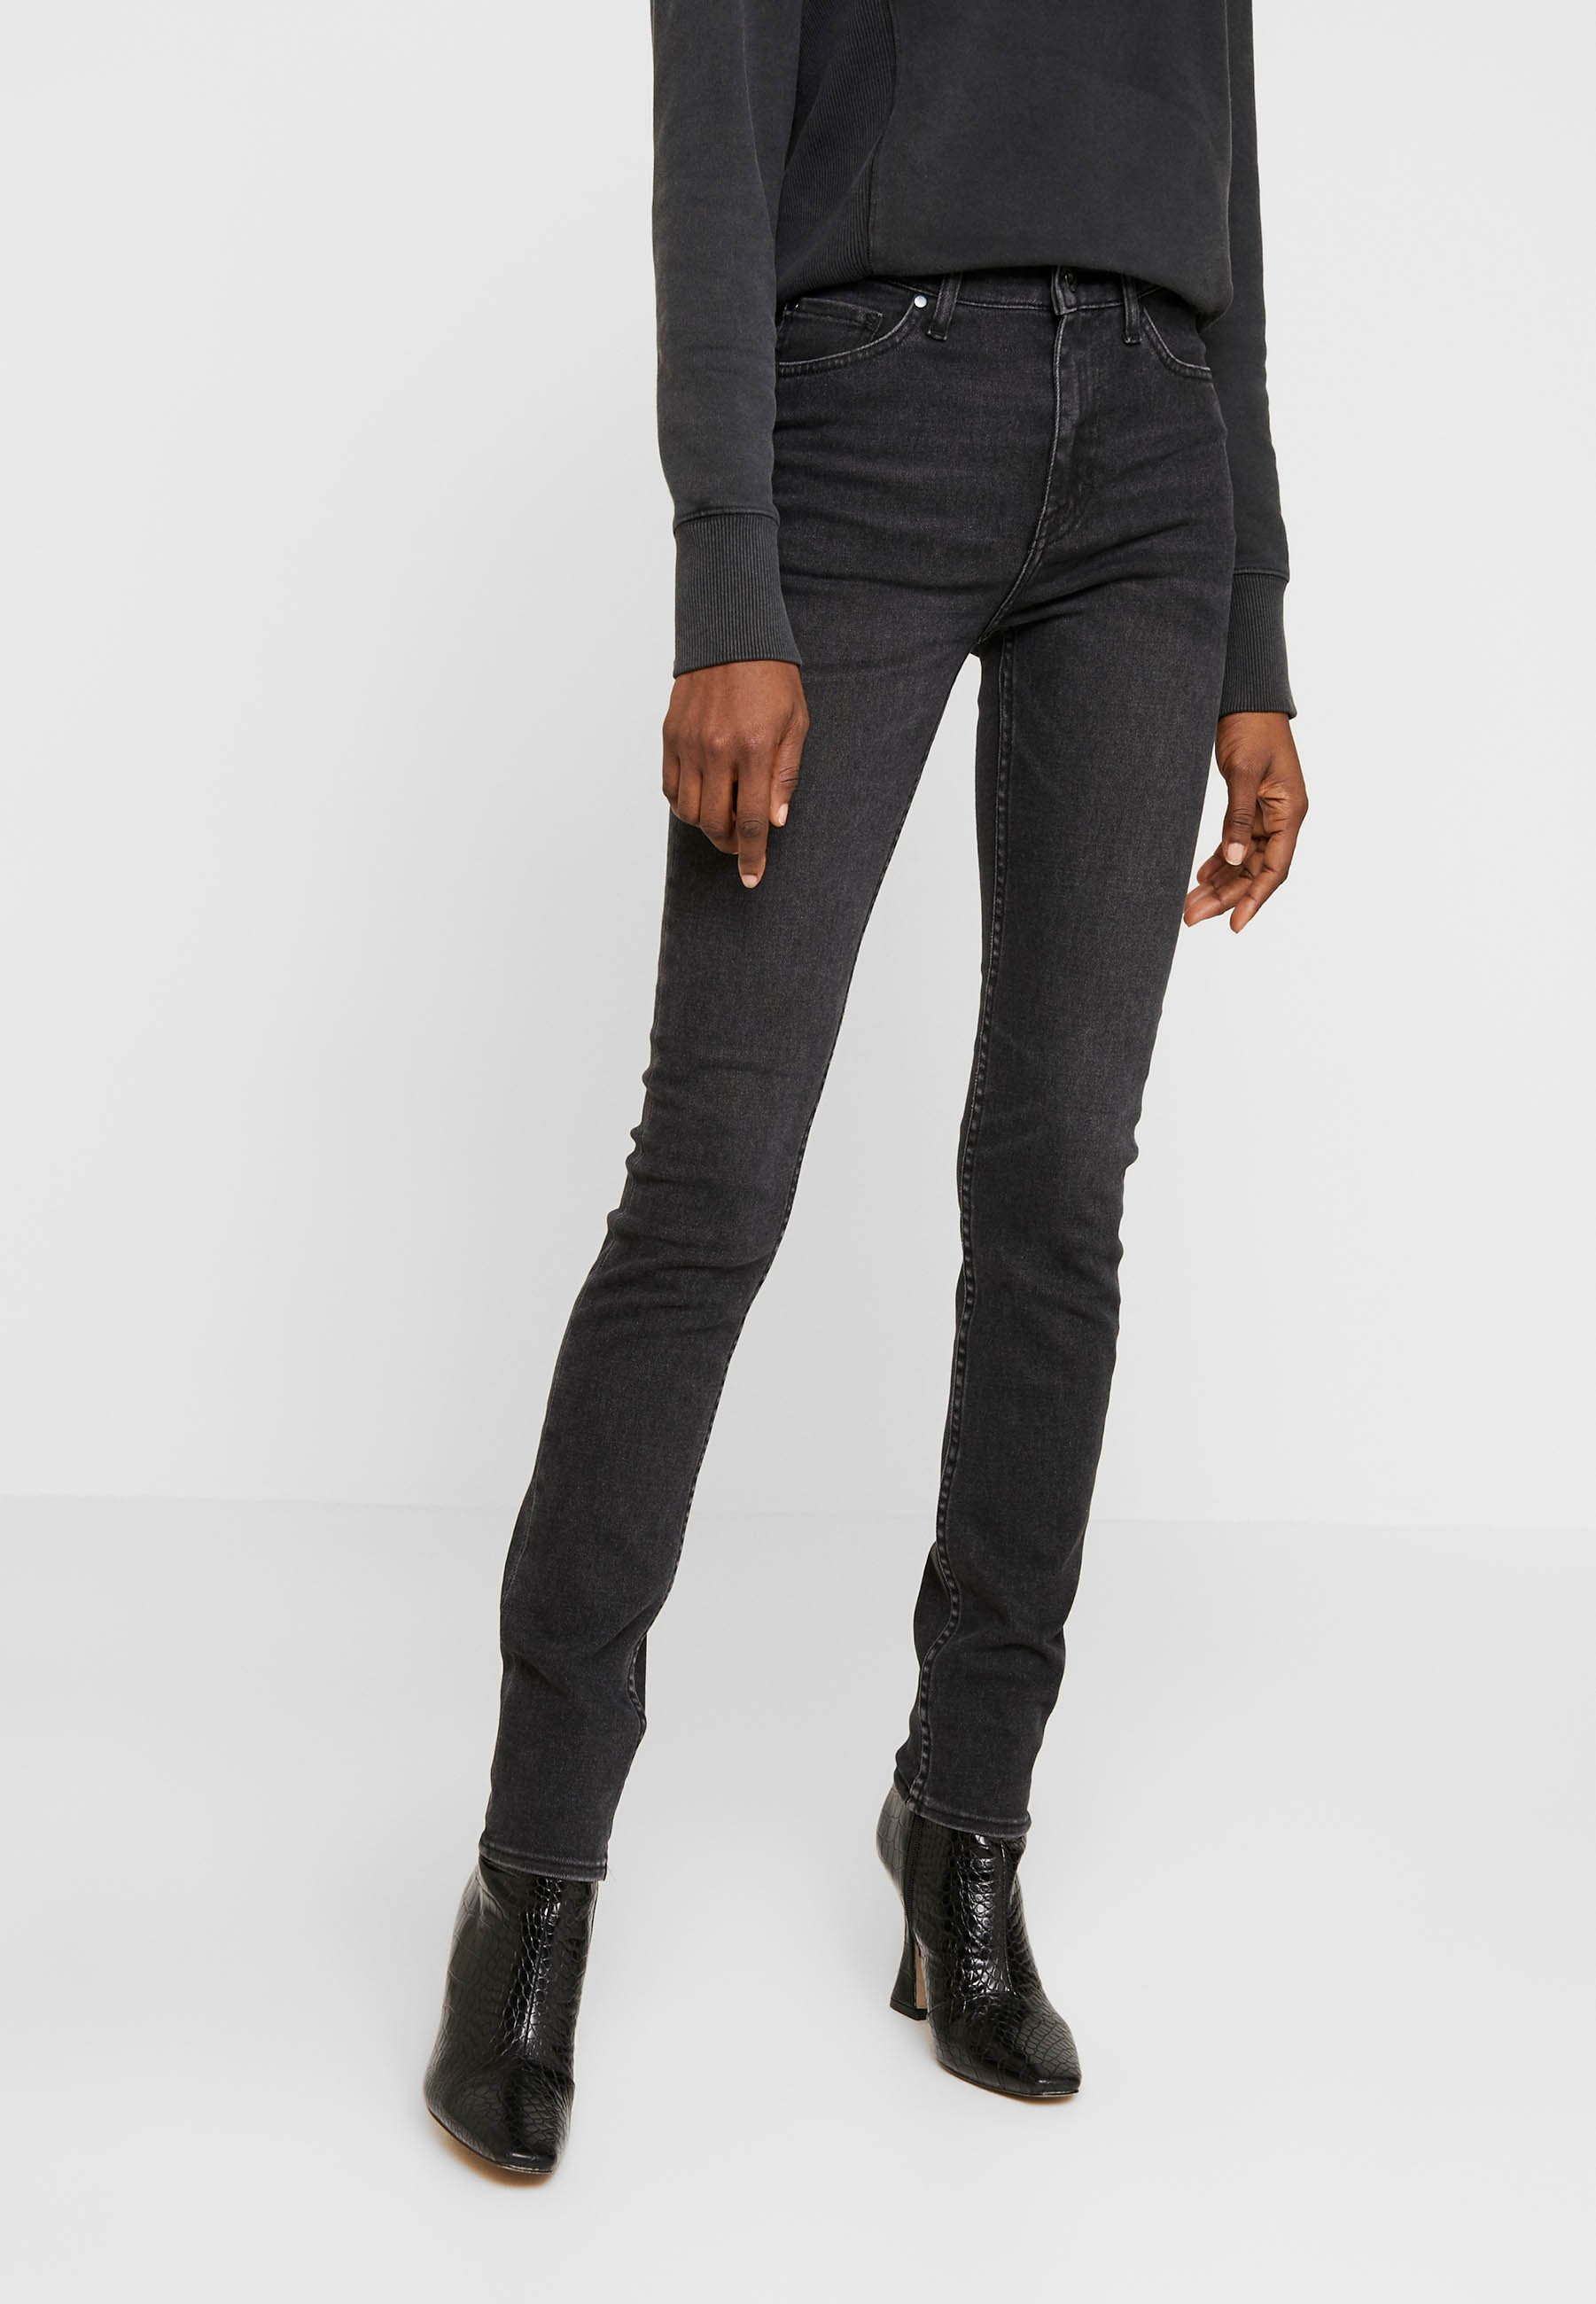 Nouveau style Meilleurs prix Tiger of Sweden Jeans SHELLY - Jeans Skinny - black - ZALANDO.FR NMih8